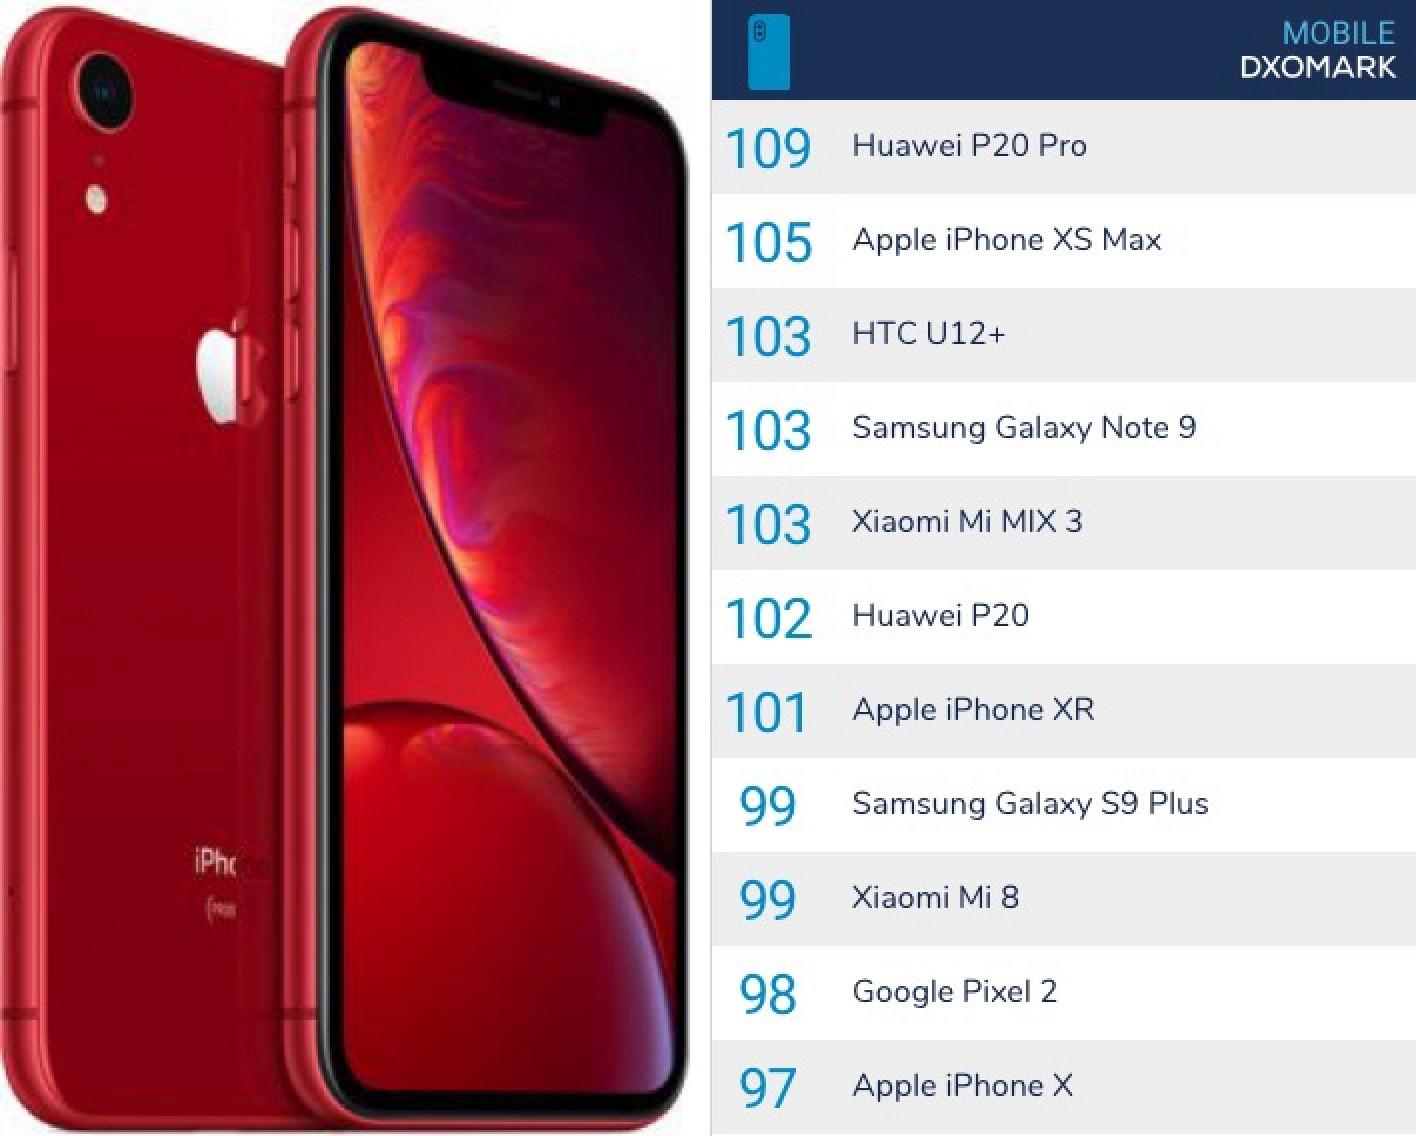 DxOMark: iPhone XR is 'Best Single-Cam Smartphone We've Tested'